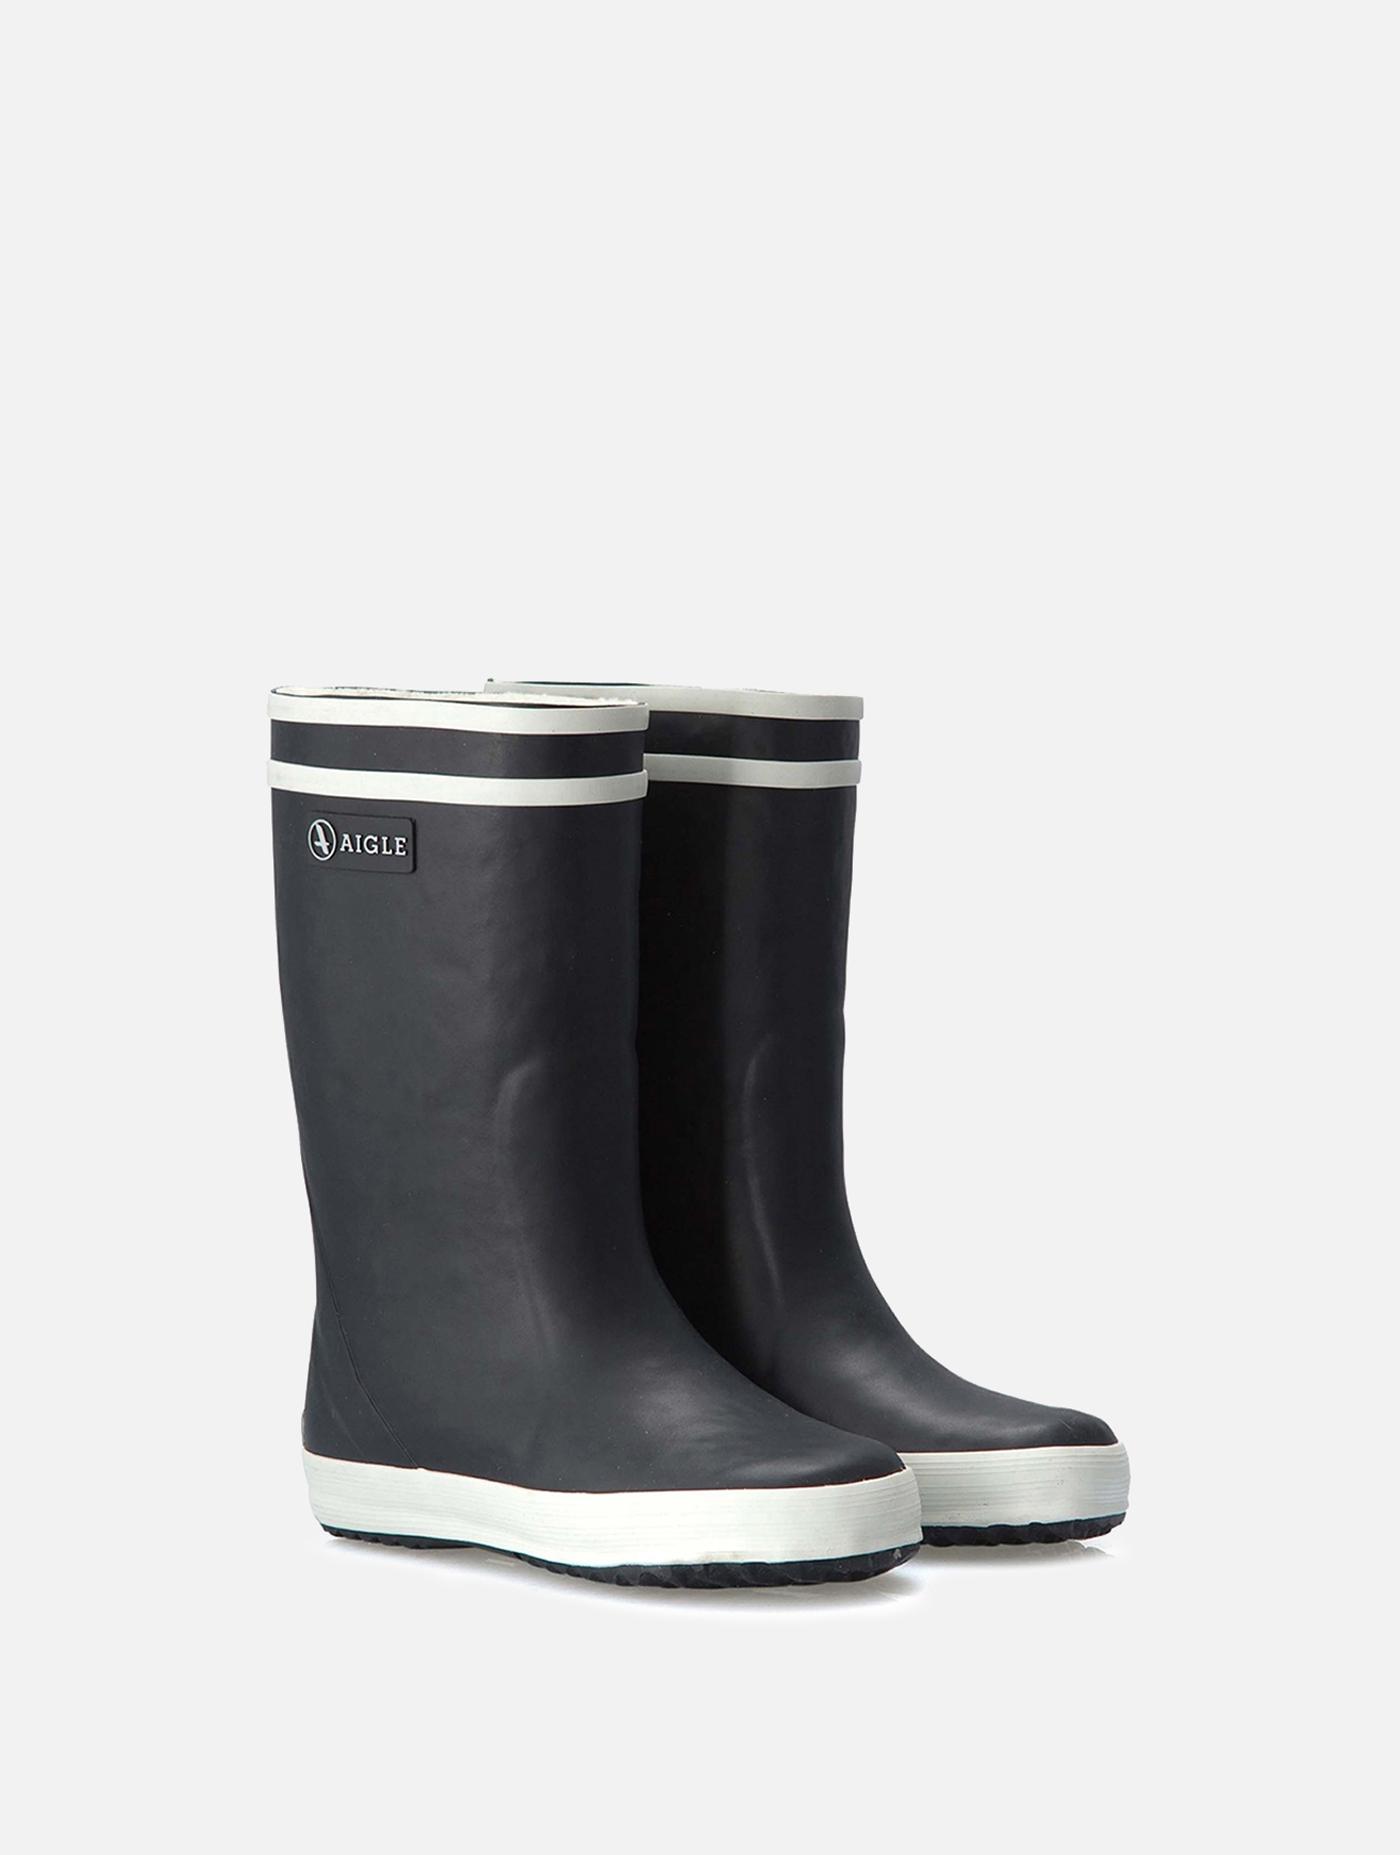 Aigle Unisex Kids Woodypop Fur Rain Boot 1.5 UK Child